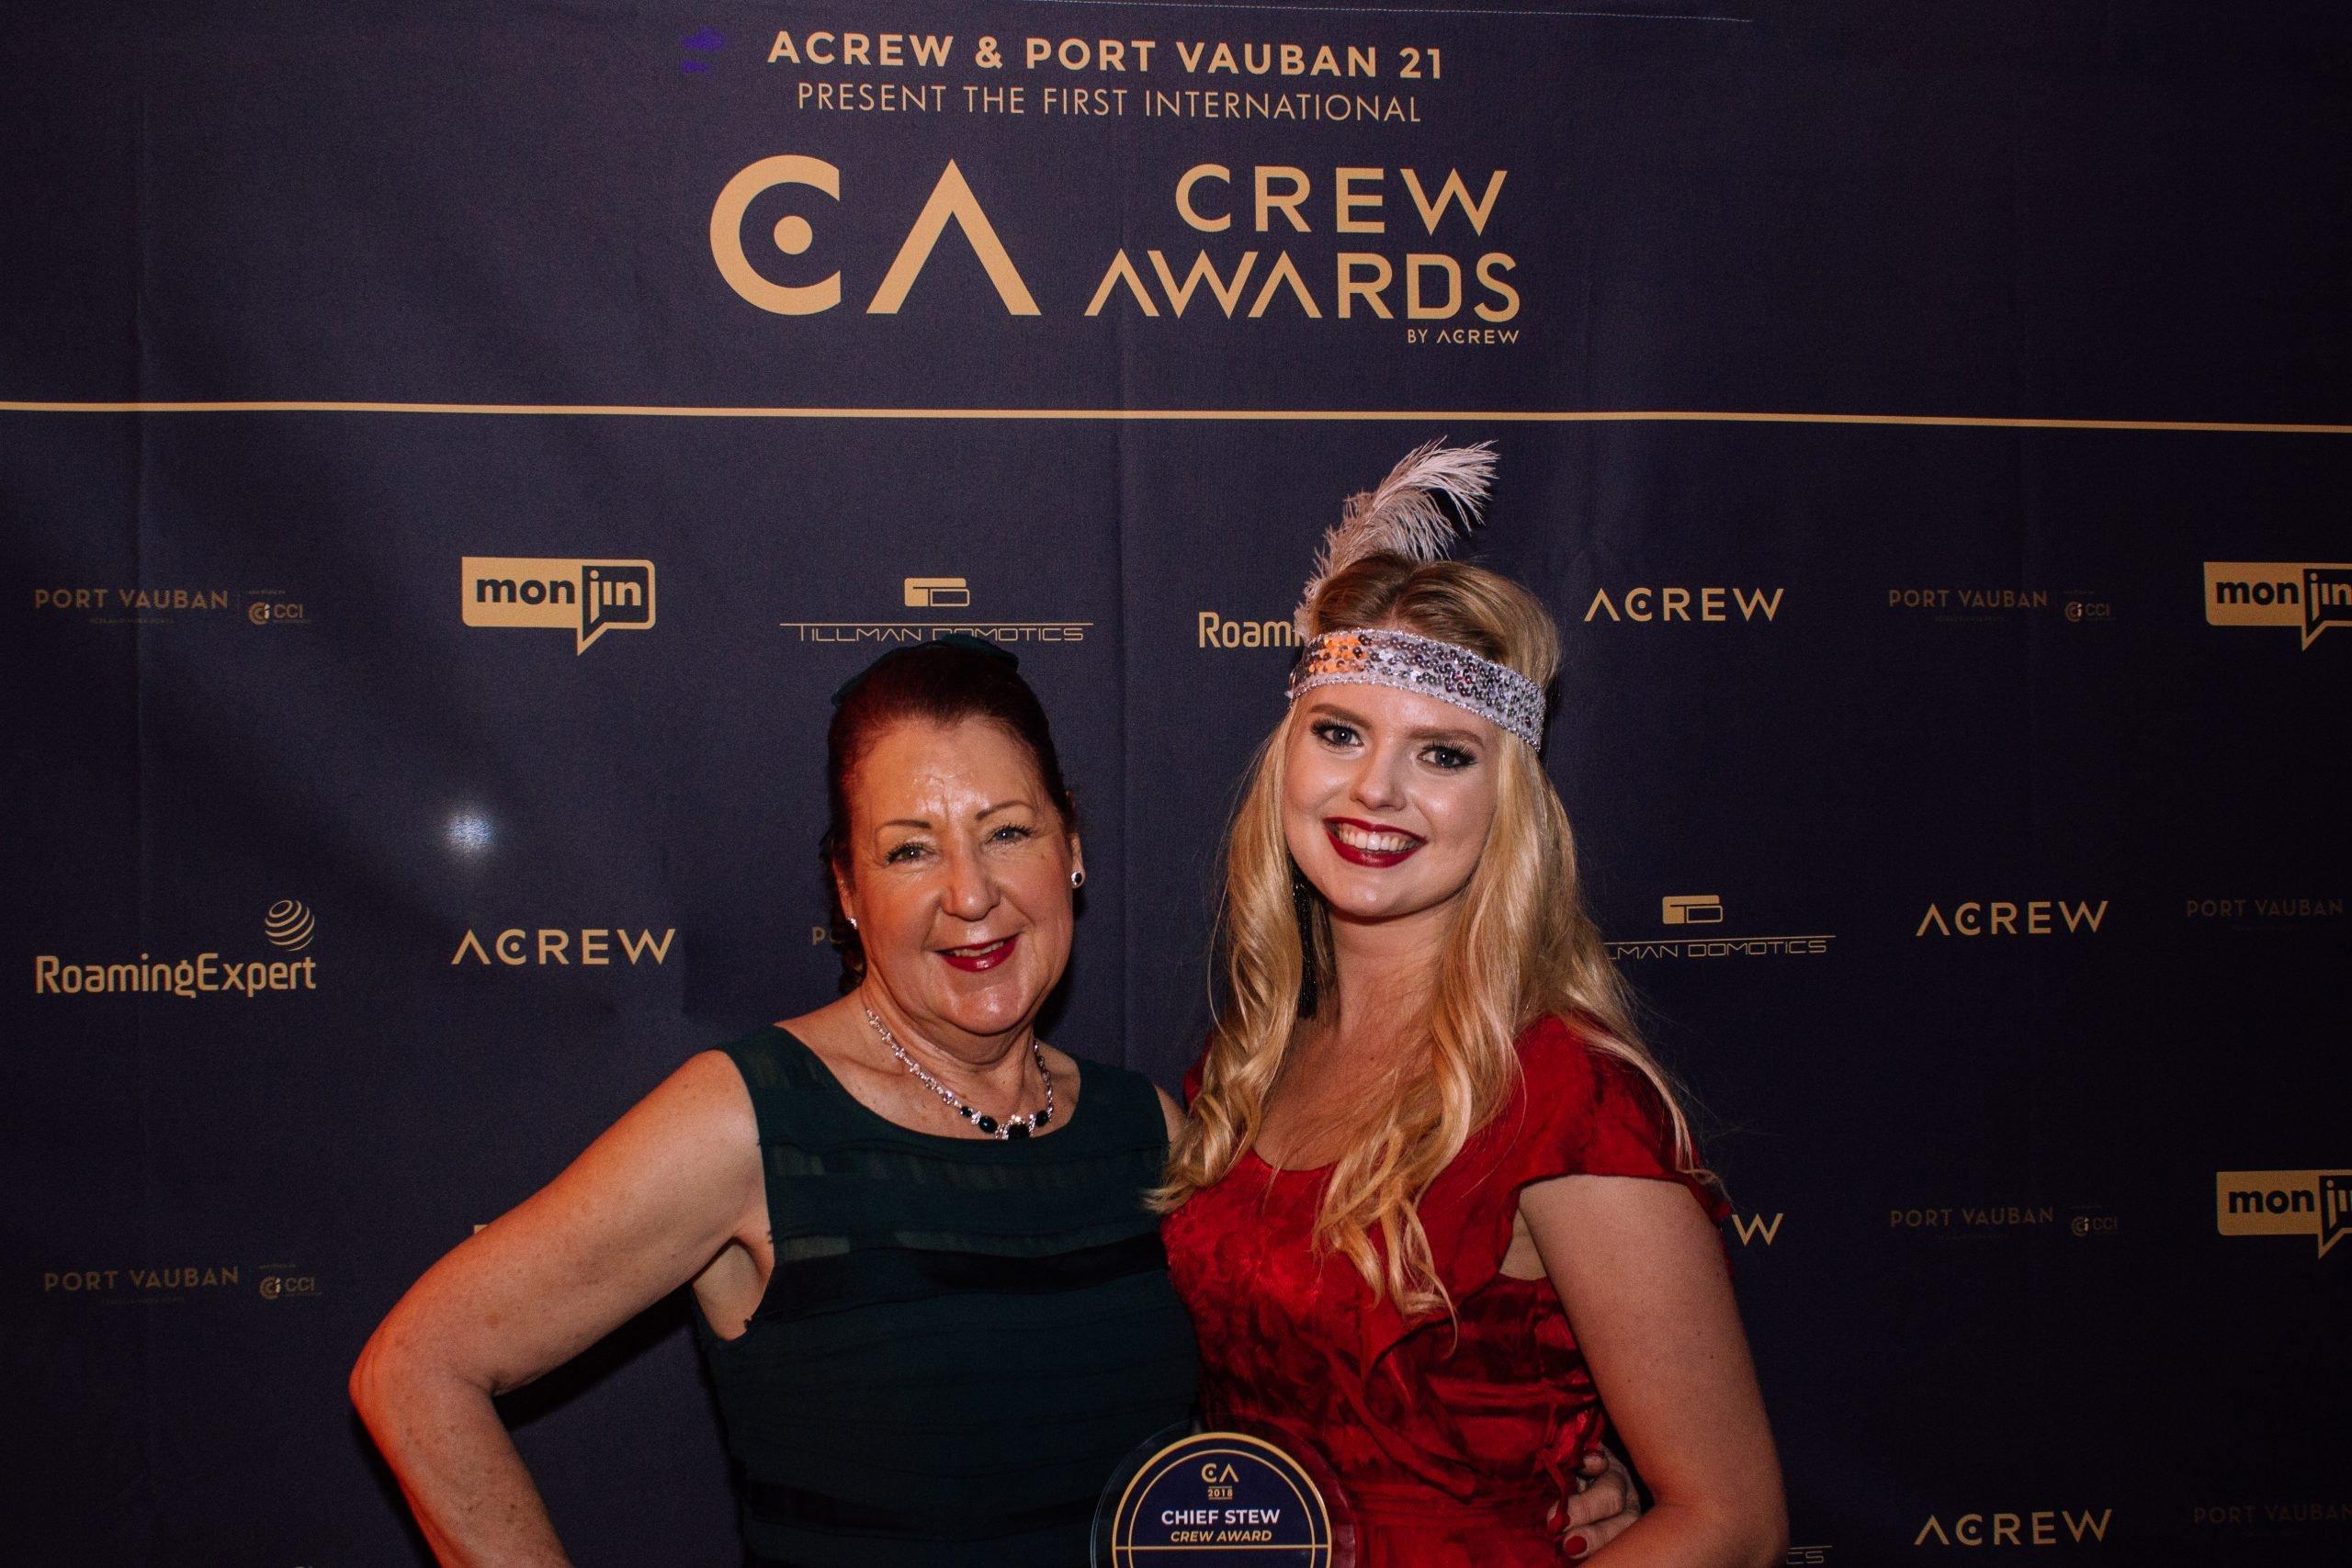 Last year's Chief Stew Crew Award winner Gemma Hulbert